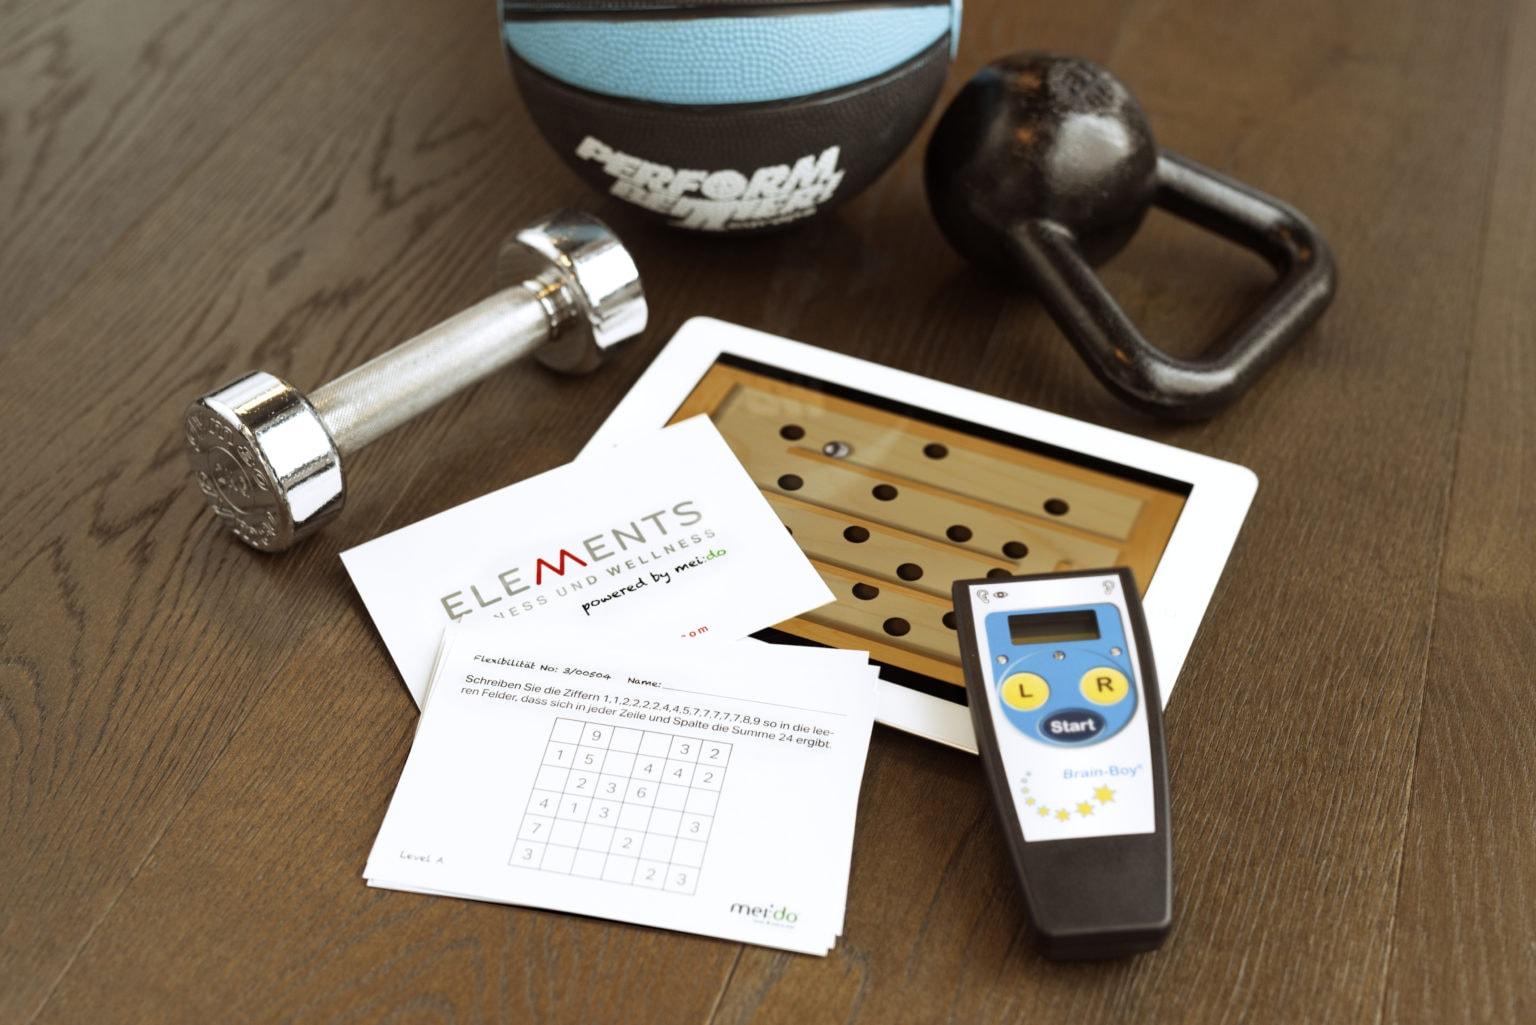 ELEMENTS Fitness und Wellness_mei-do